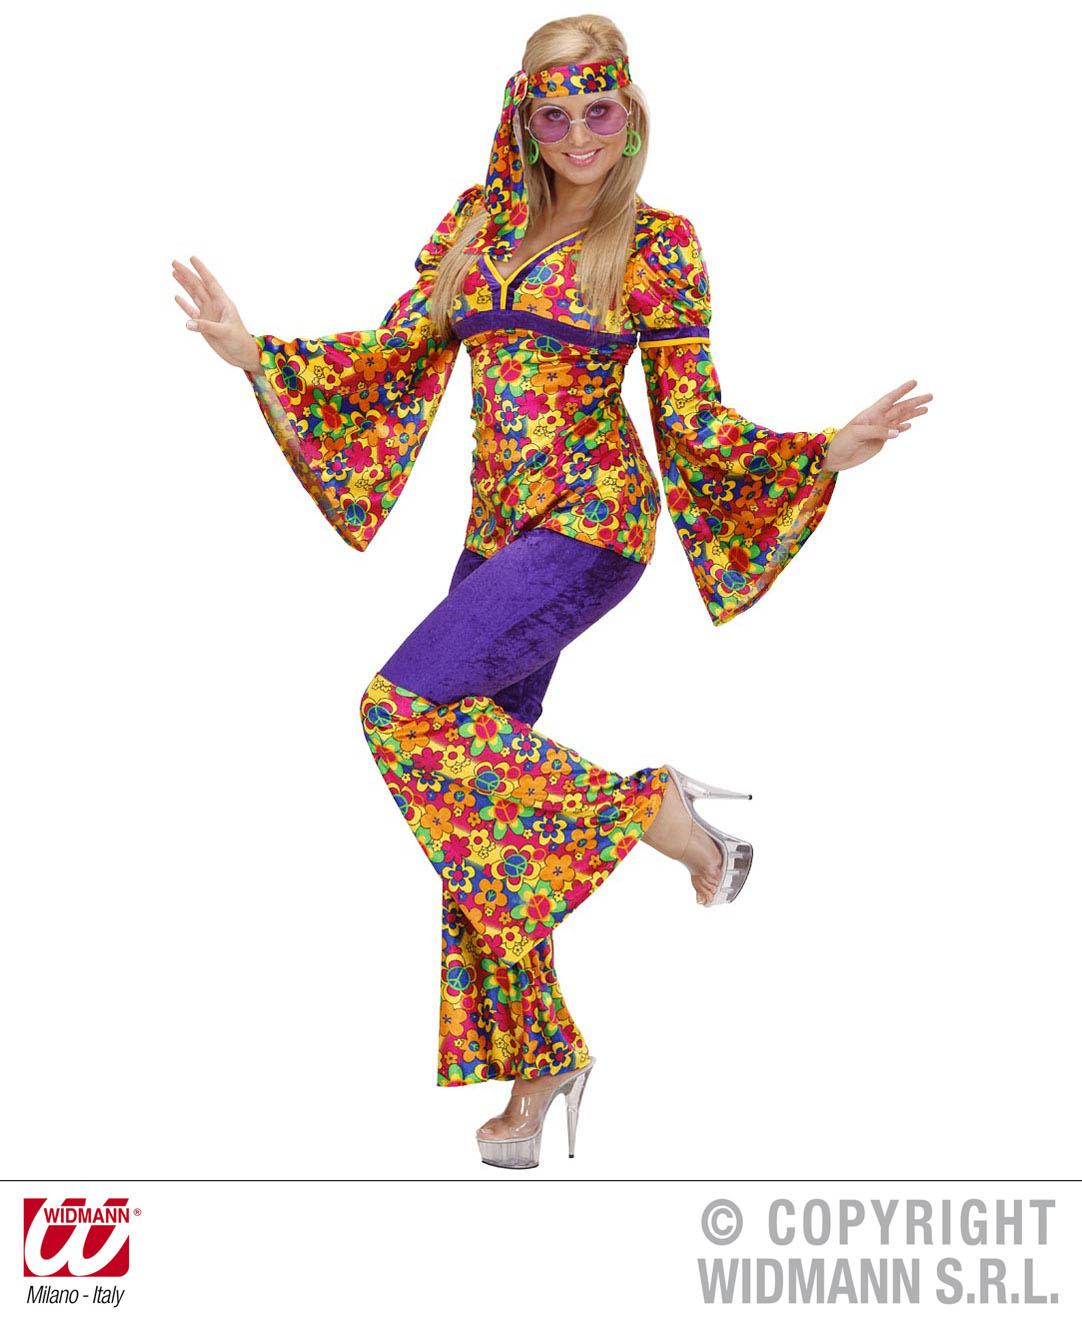 70er Woodstock Hippie Kostüm 3tlg. Frau, S -36-38, M -38-40, L -40-42, XL 42-44